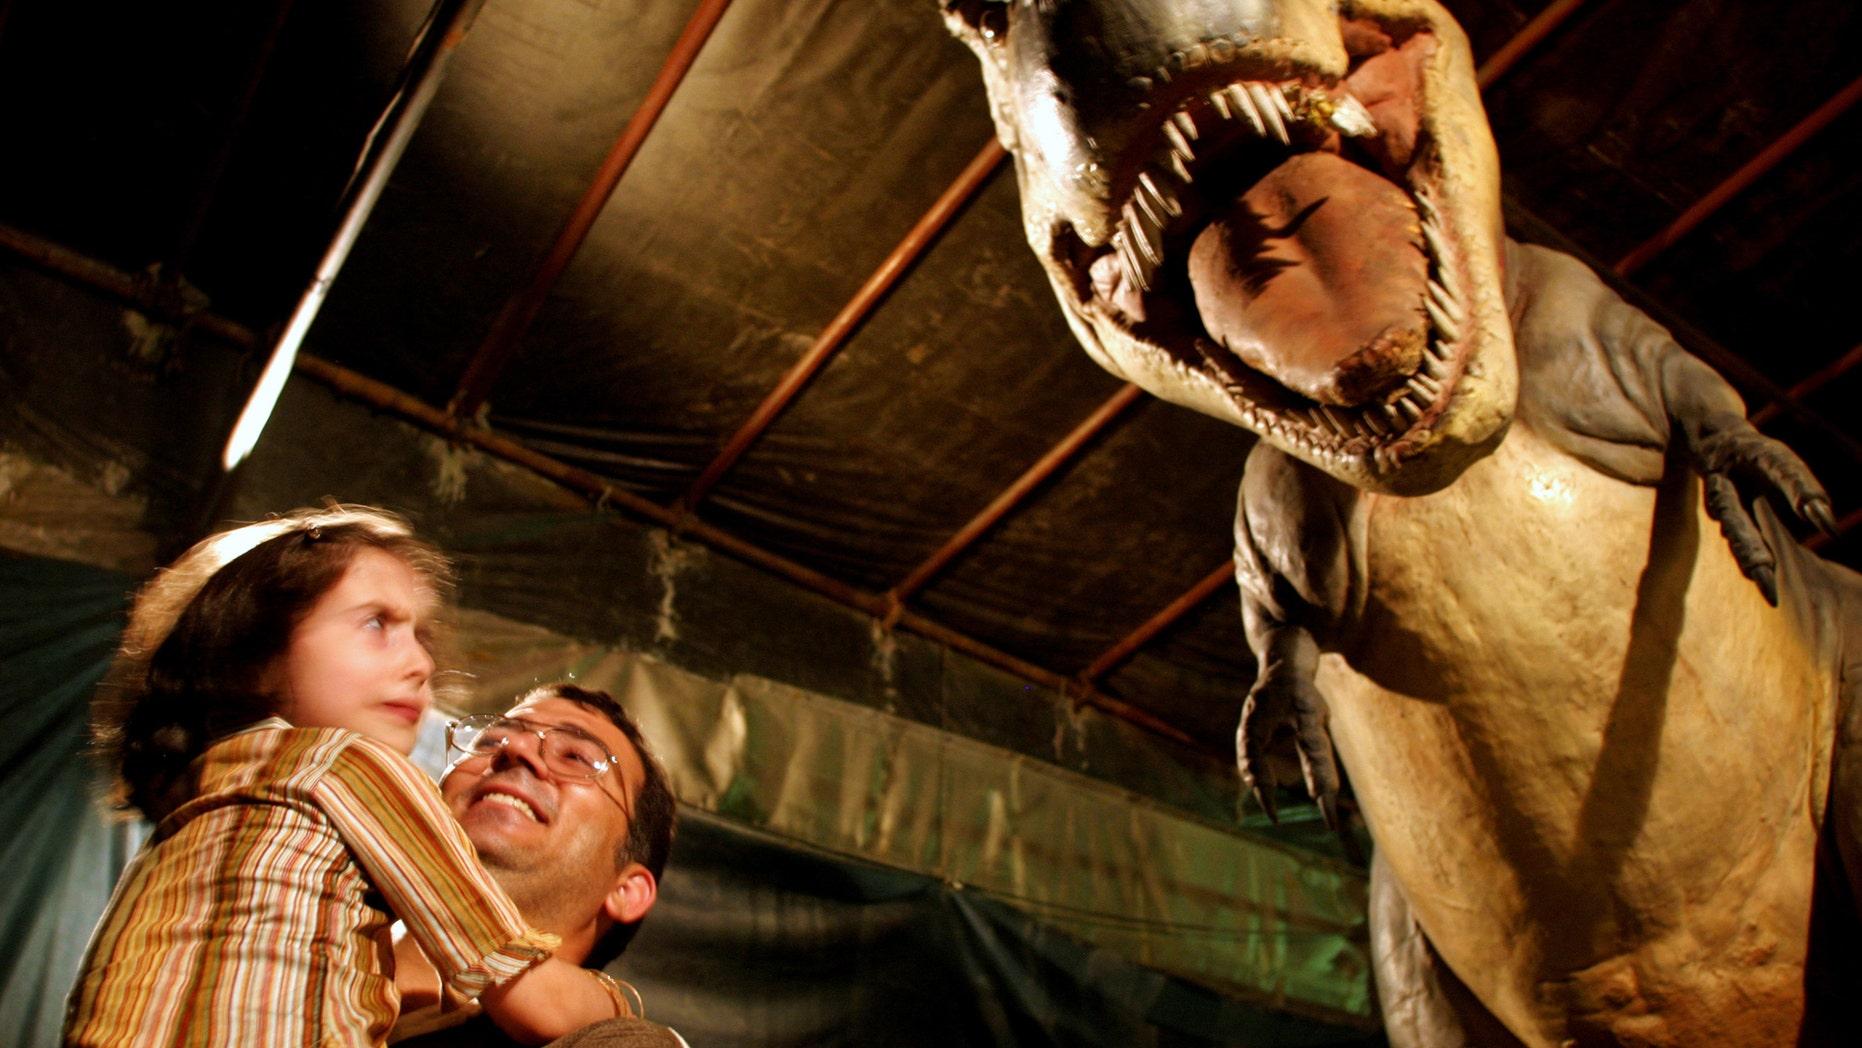 File photo: Iranian girl looks at a life sized robot of a Tyrannasaurus rex at Tehran's Jurassic Park dinosaur exhibition. An Iranian girl looks at a life sized robot of a Tyrannosaurus rex at a Jurassic Park dinosaur exhibition in Tehran July 6, 2005. (REUTERS/Morteza Nikoubazl)